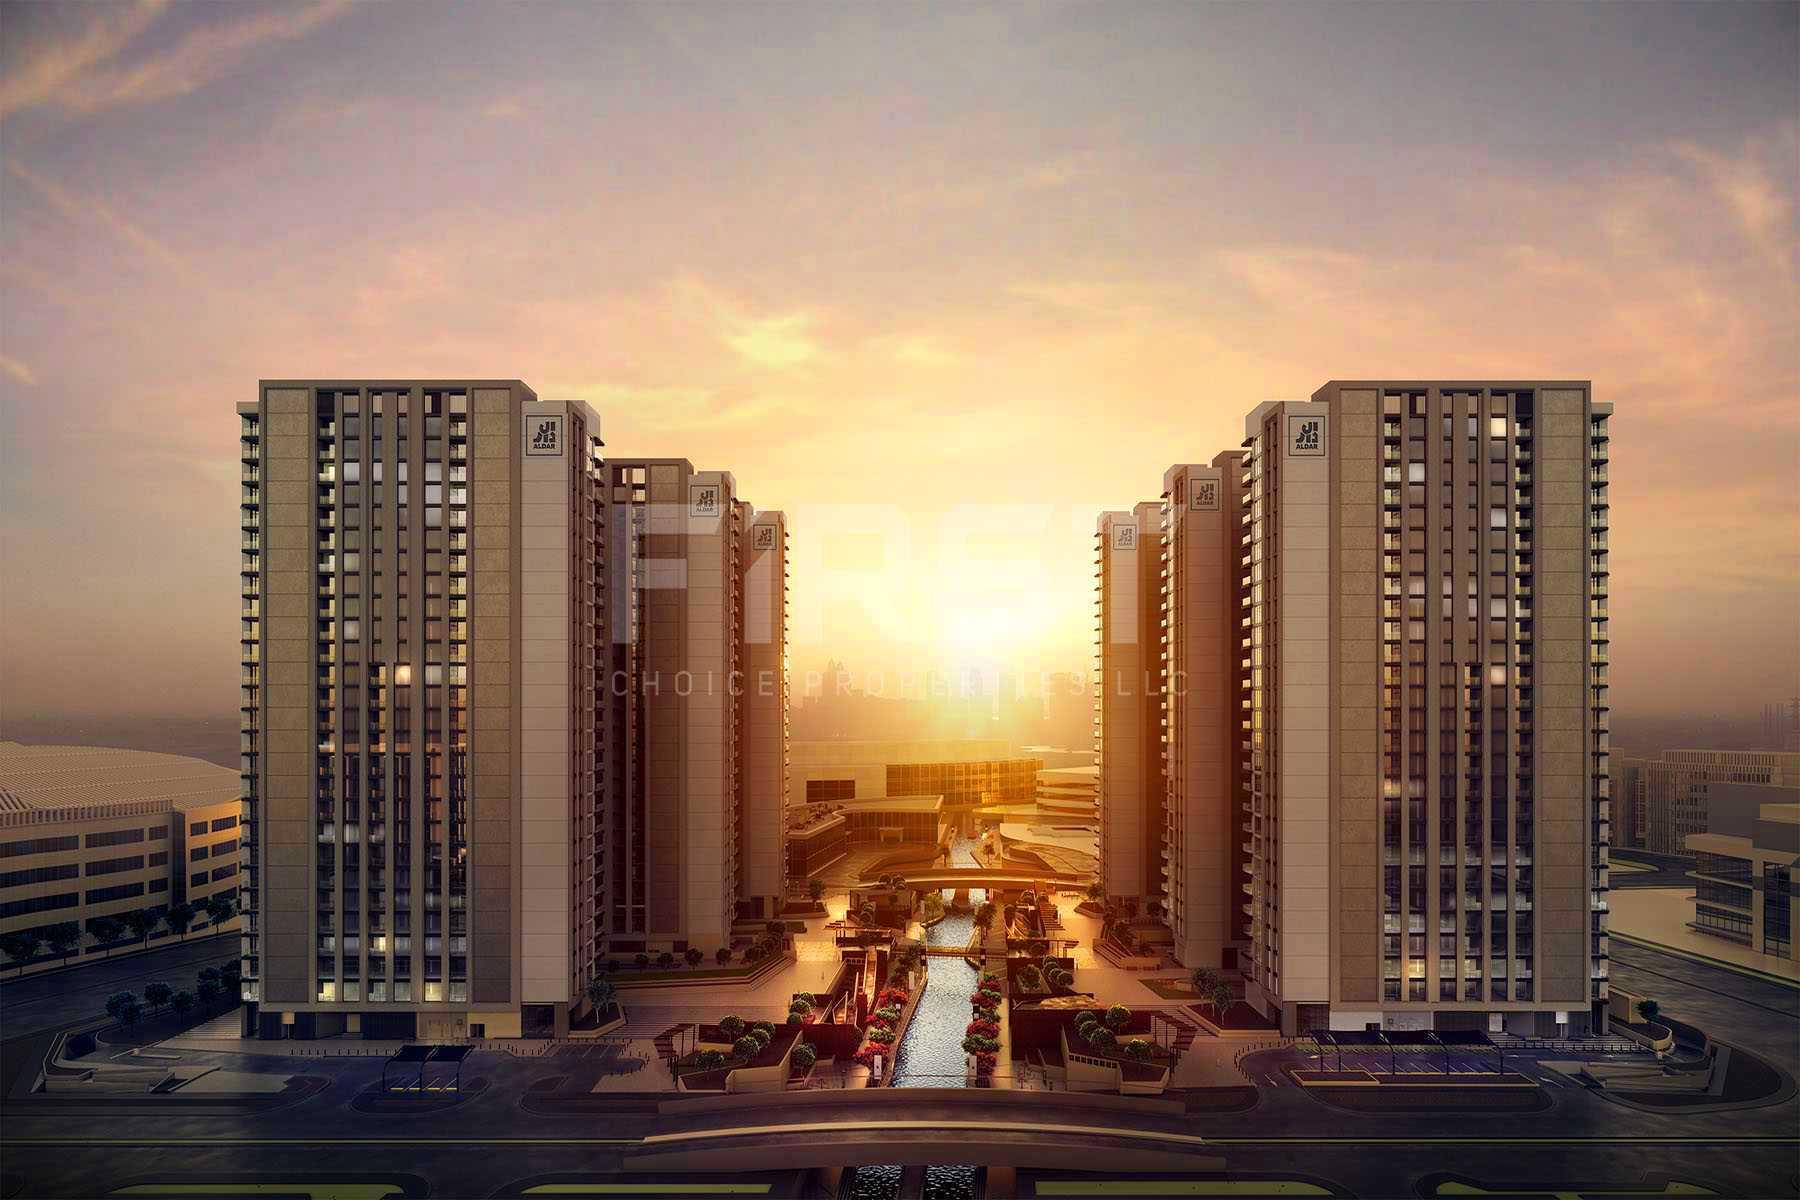 Studio,1 Bedroom, 2 Bedroom, 3 Bedroom,Apartment in The Bridges,Shams Abu Dhabi,Al Reem Island- Abu Dhabi-UAE (12).jpg